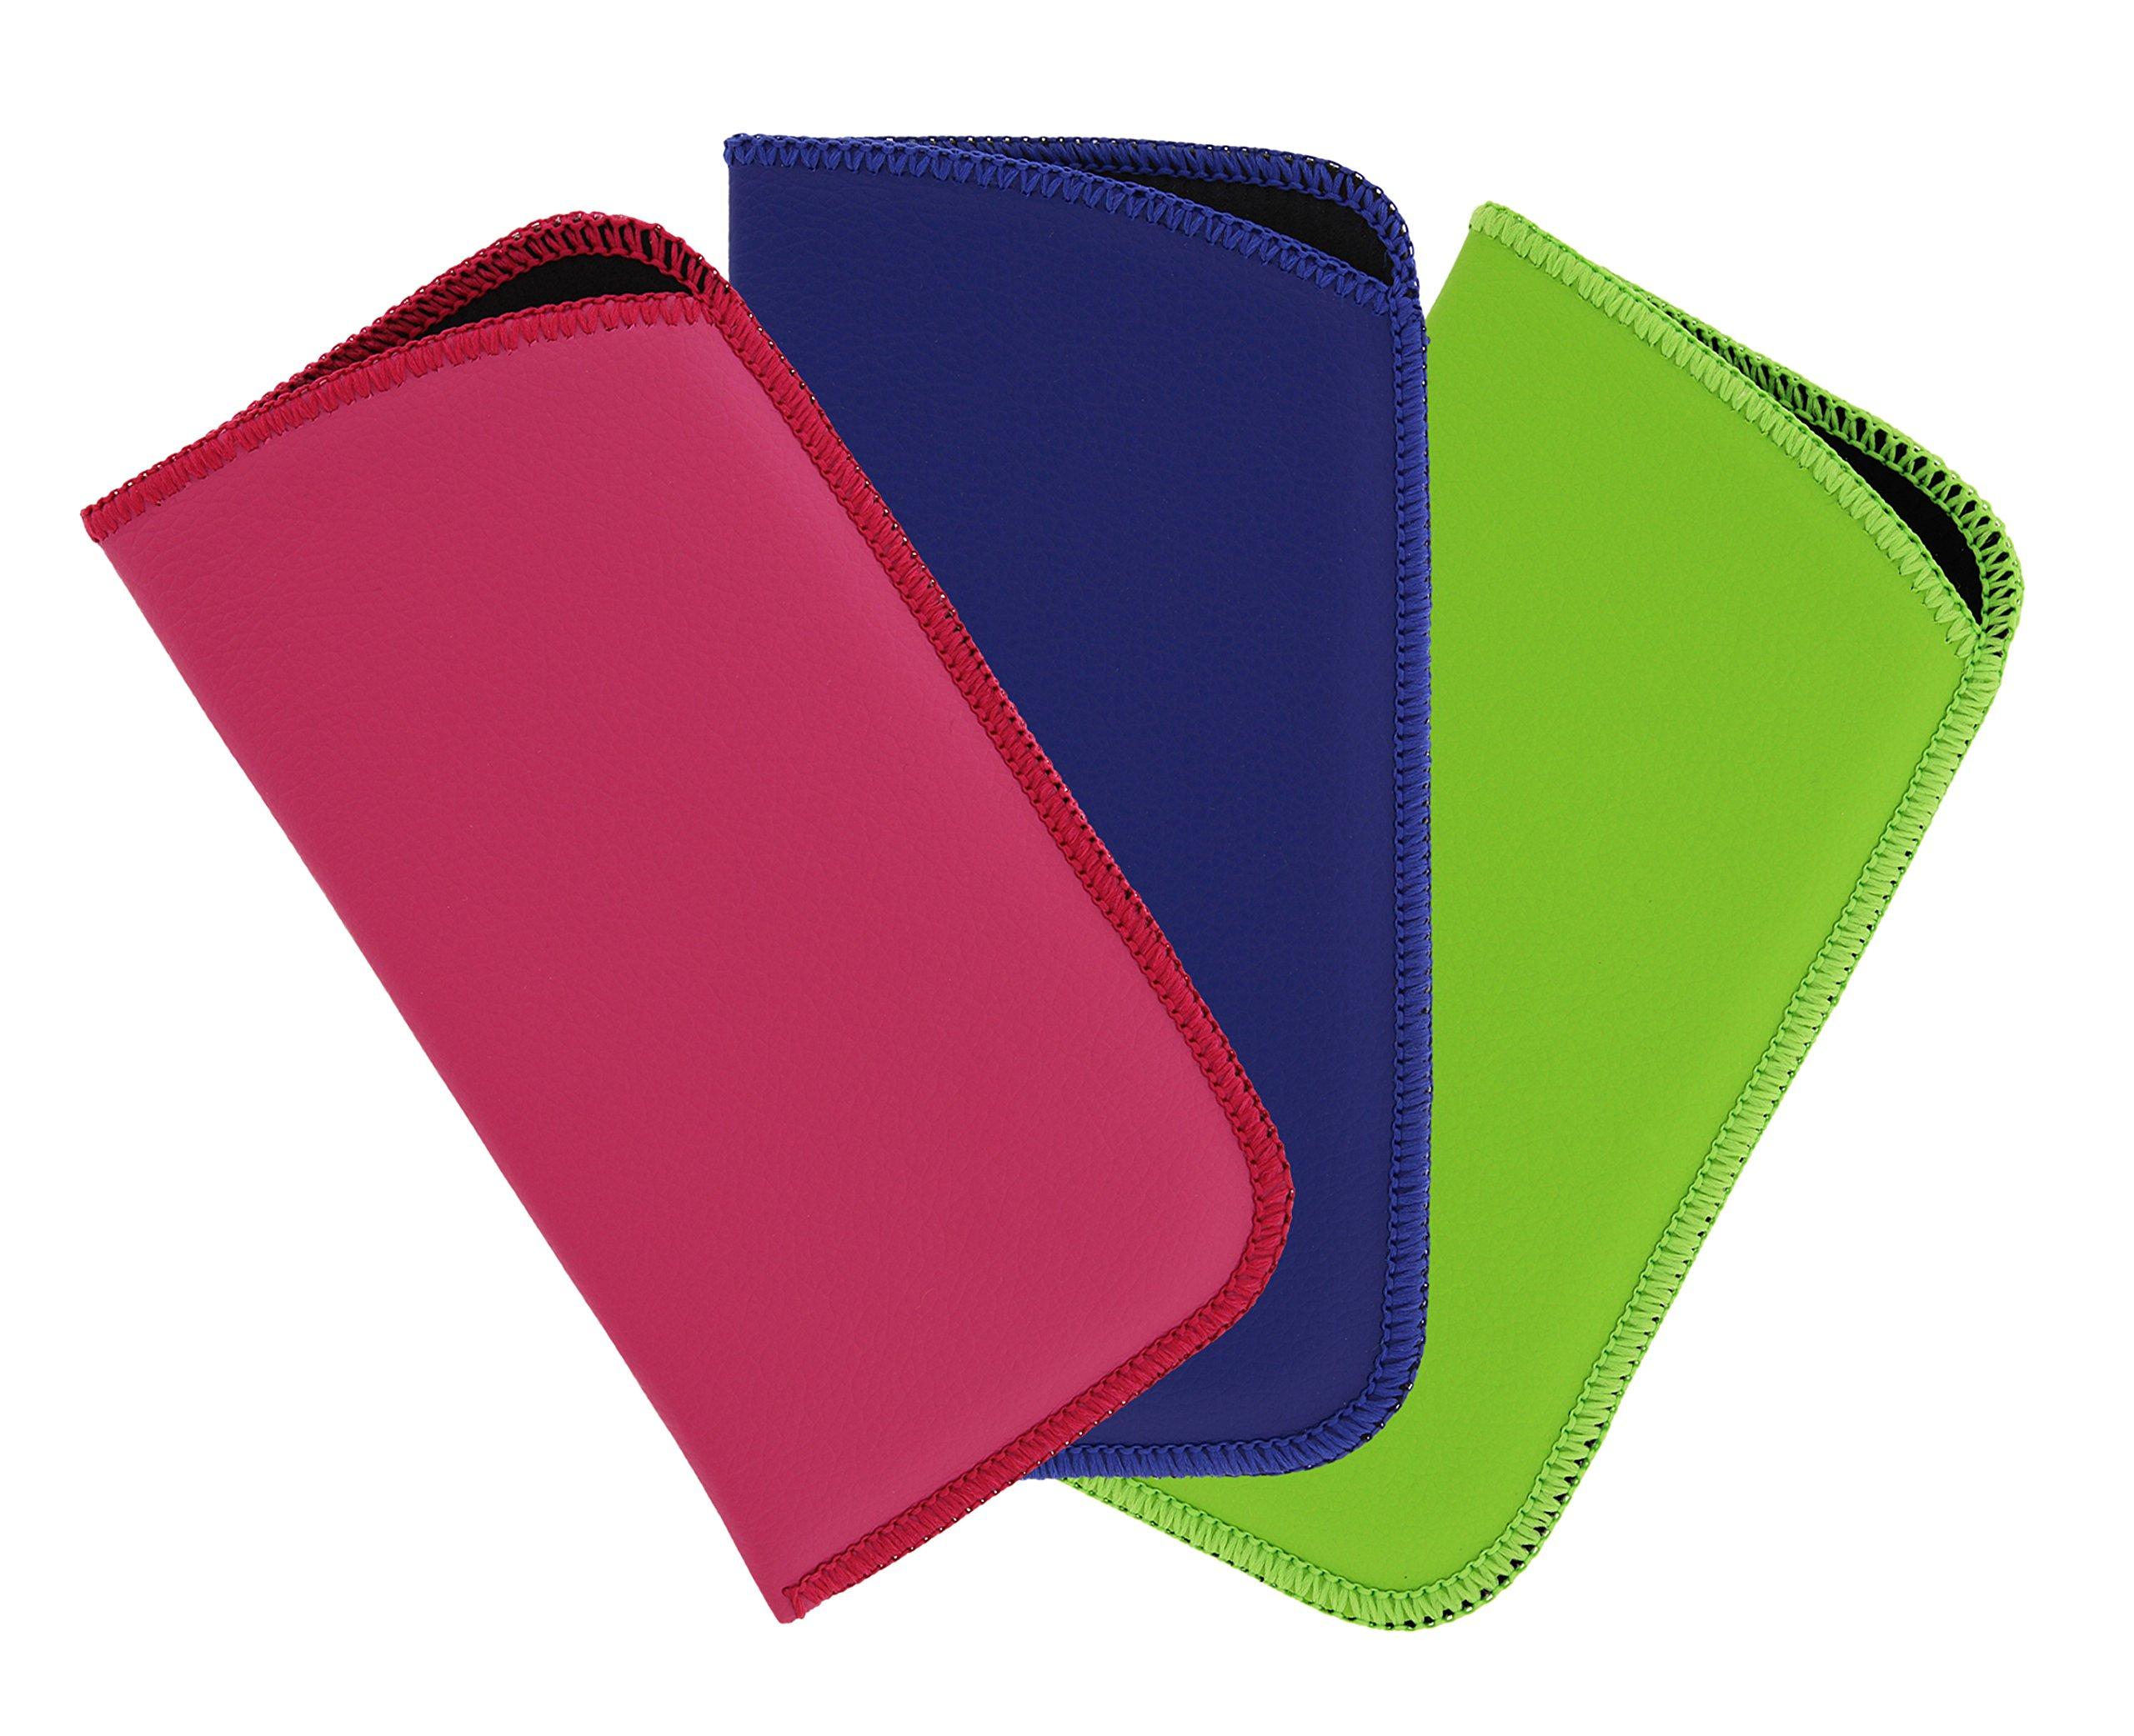 3 Pack Faux Leather Soft Slip In Eyeglass Case For Women & Men, Pink/Blue/Green